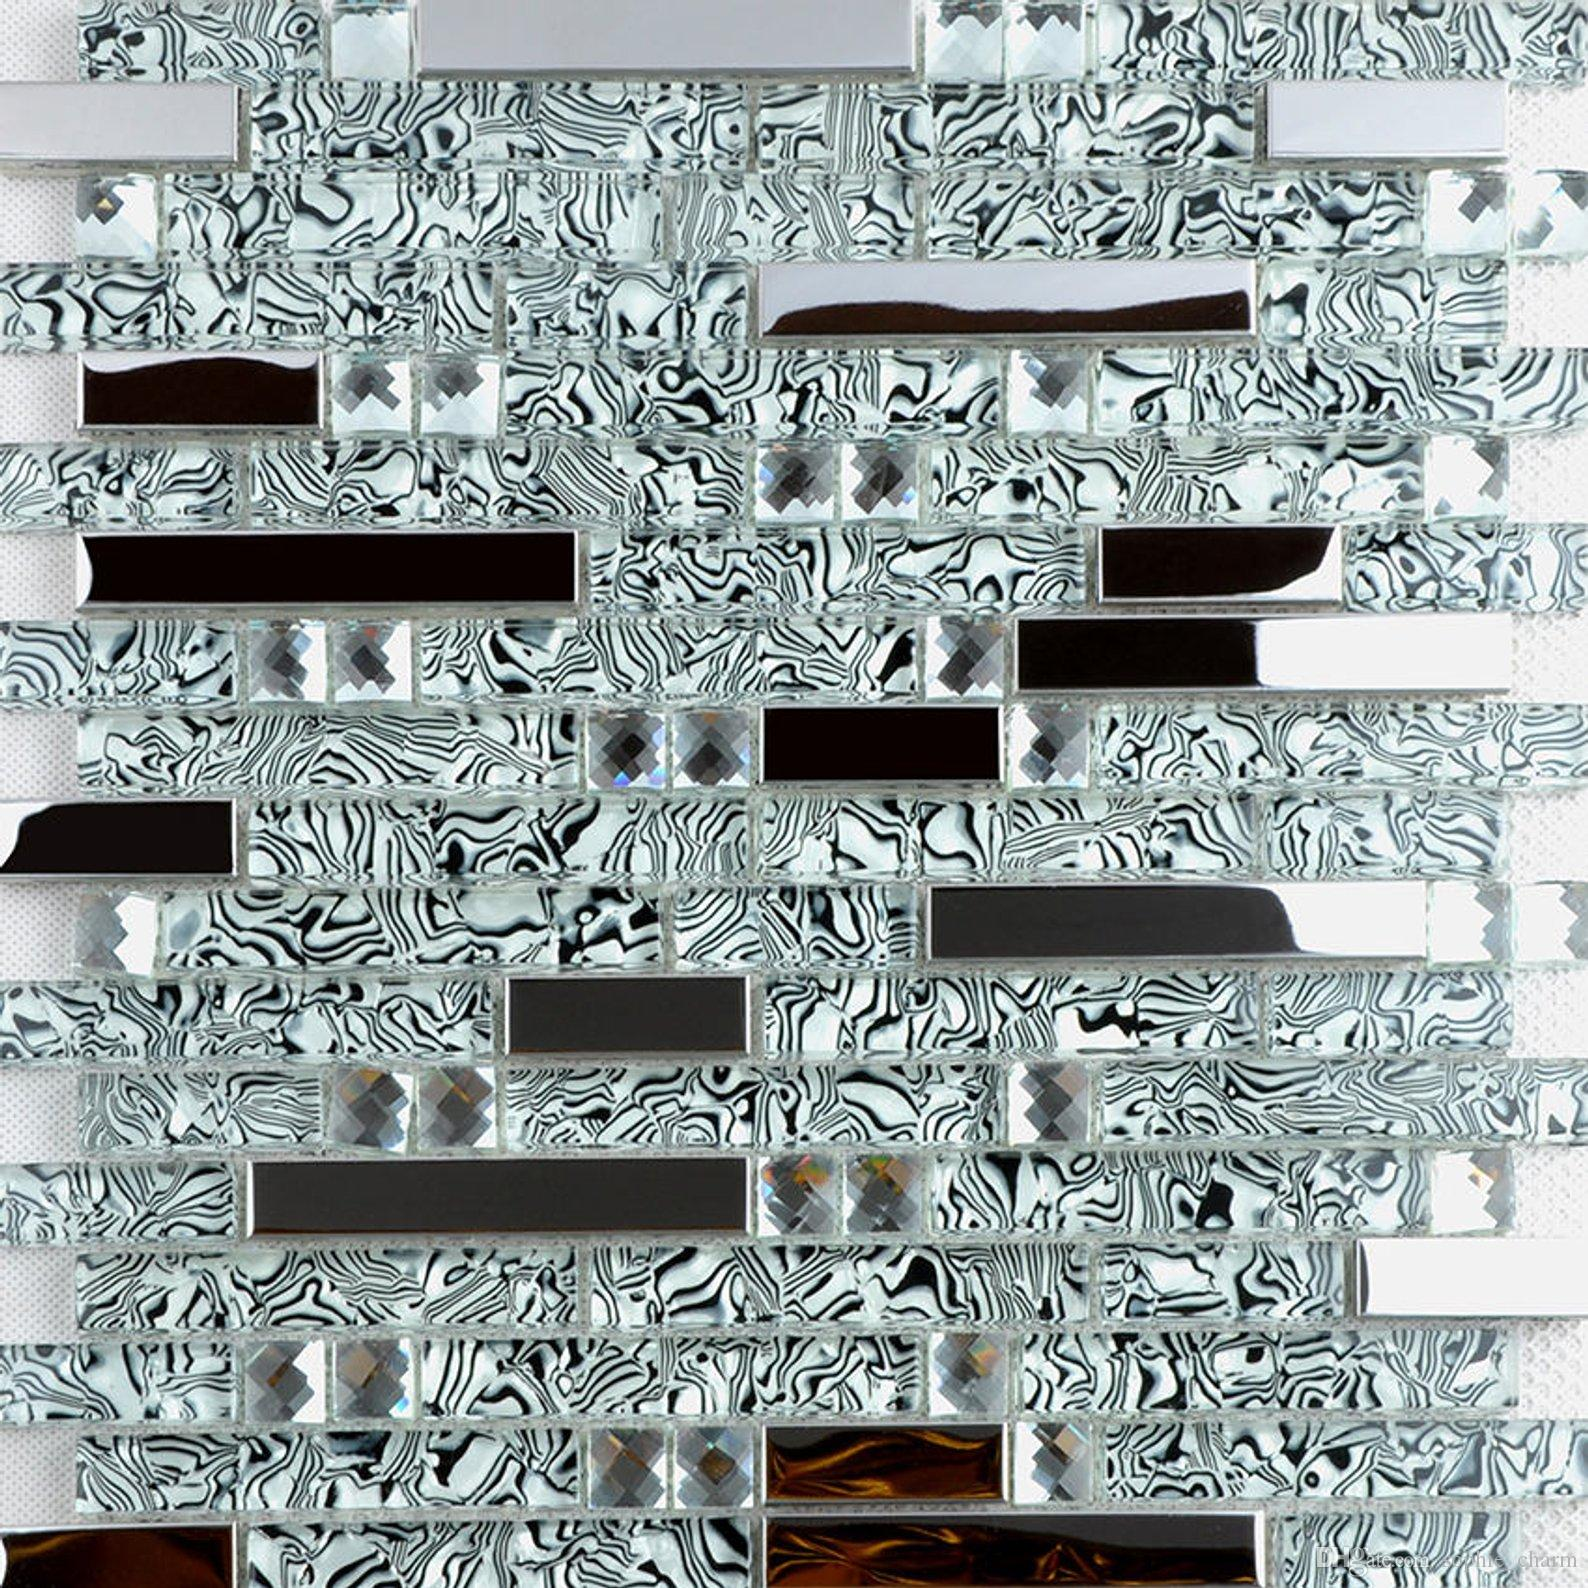 Super Black White Glass Mosaic Silver Metal Kitchen Tile Backsplash Silver Stainless Steel Glass Tiles Ssmt397 Glass Mosaic Bathroom Tile Interior Design Ideas Gentotthenellocom